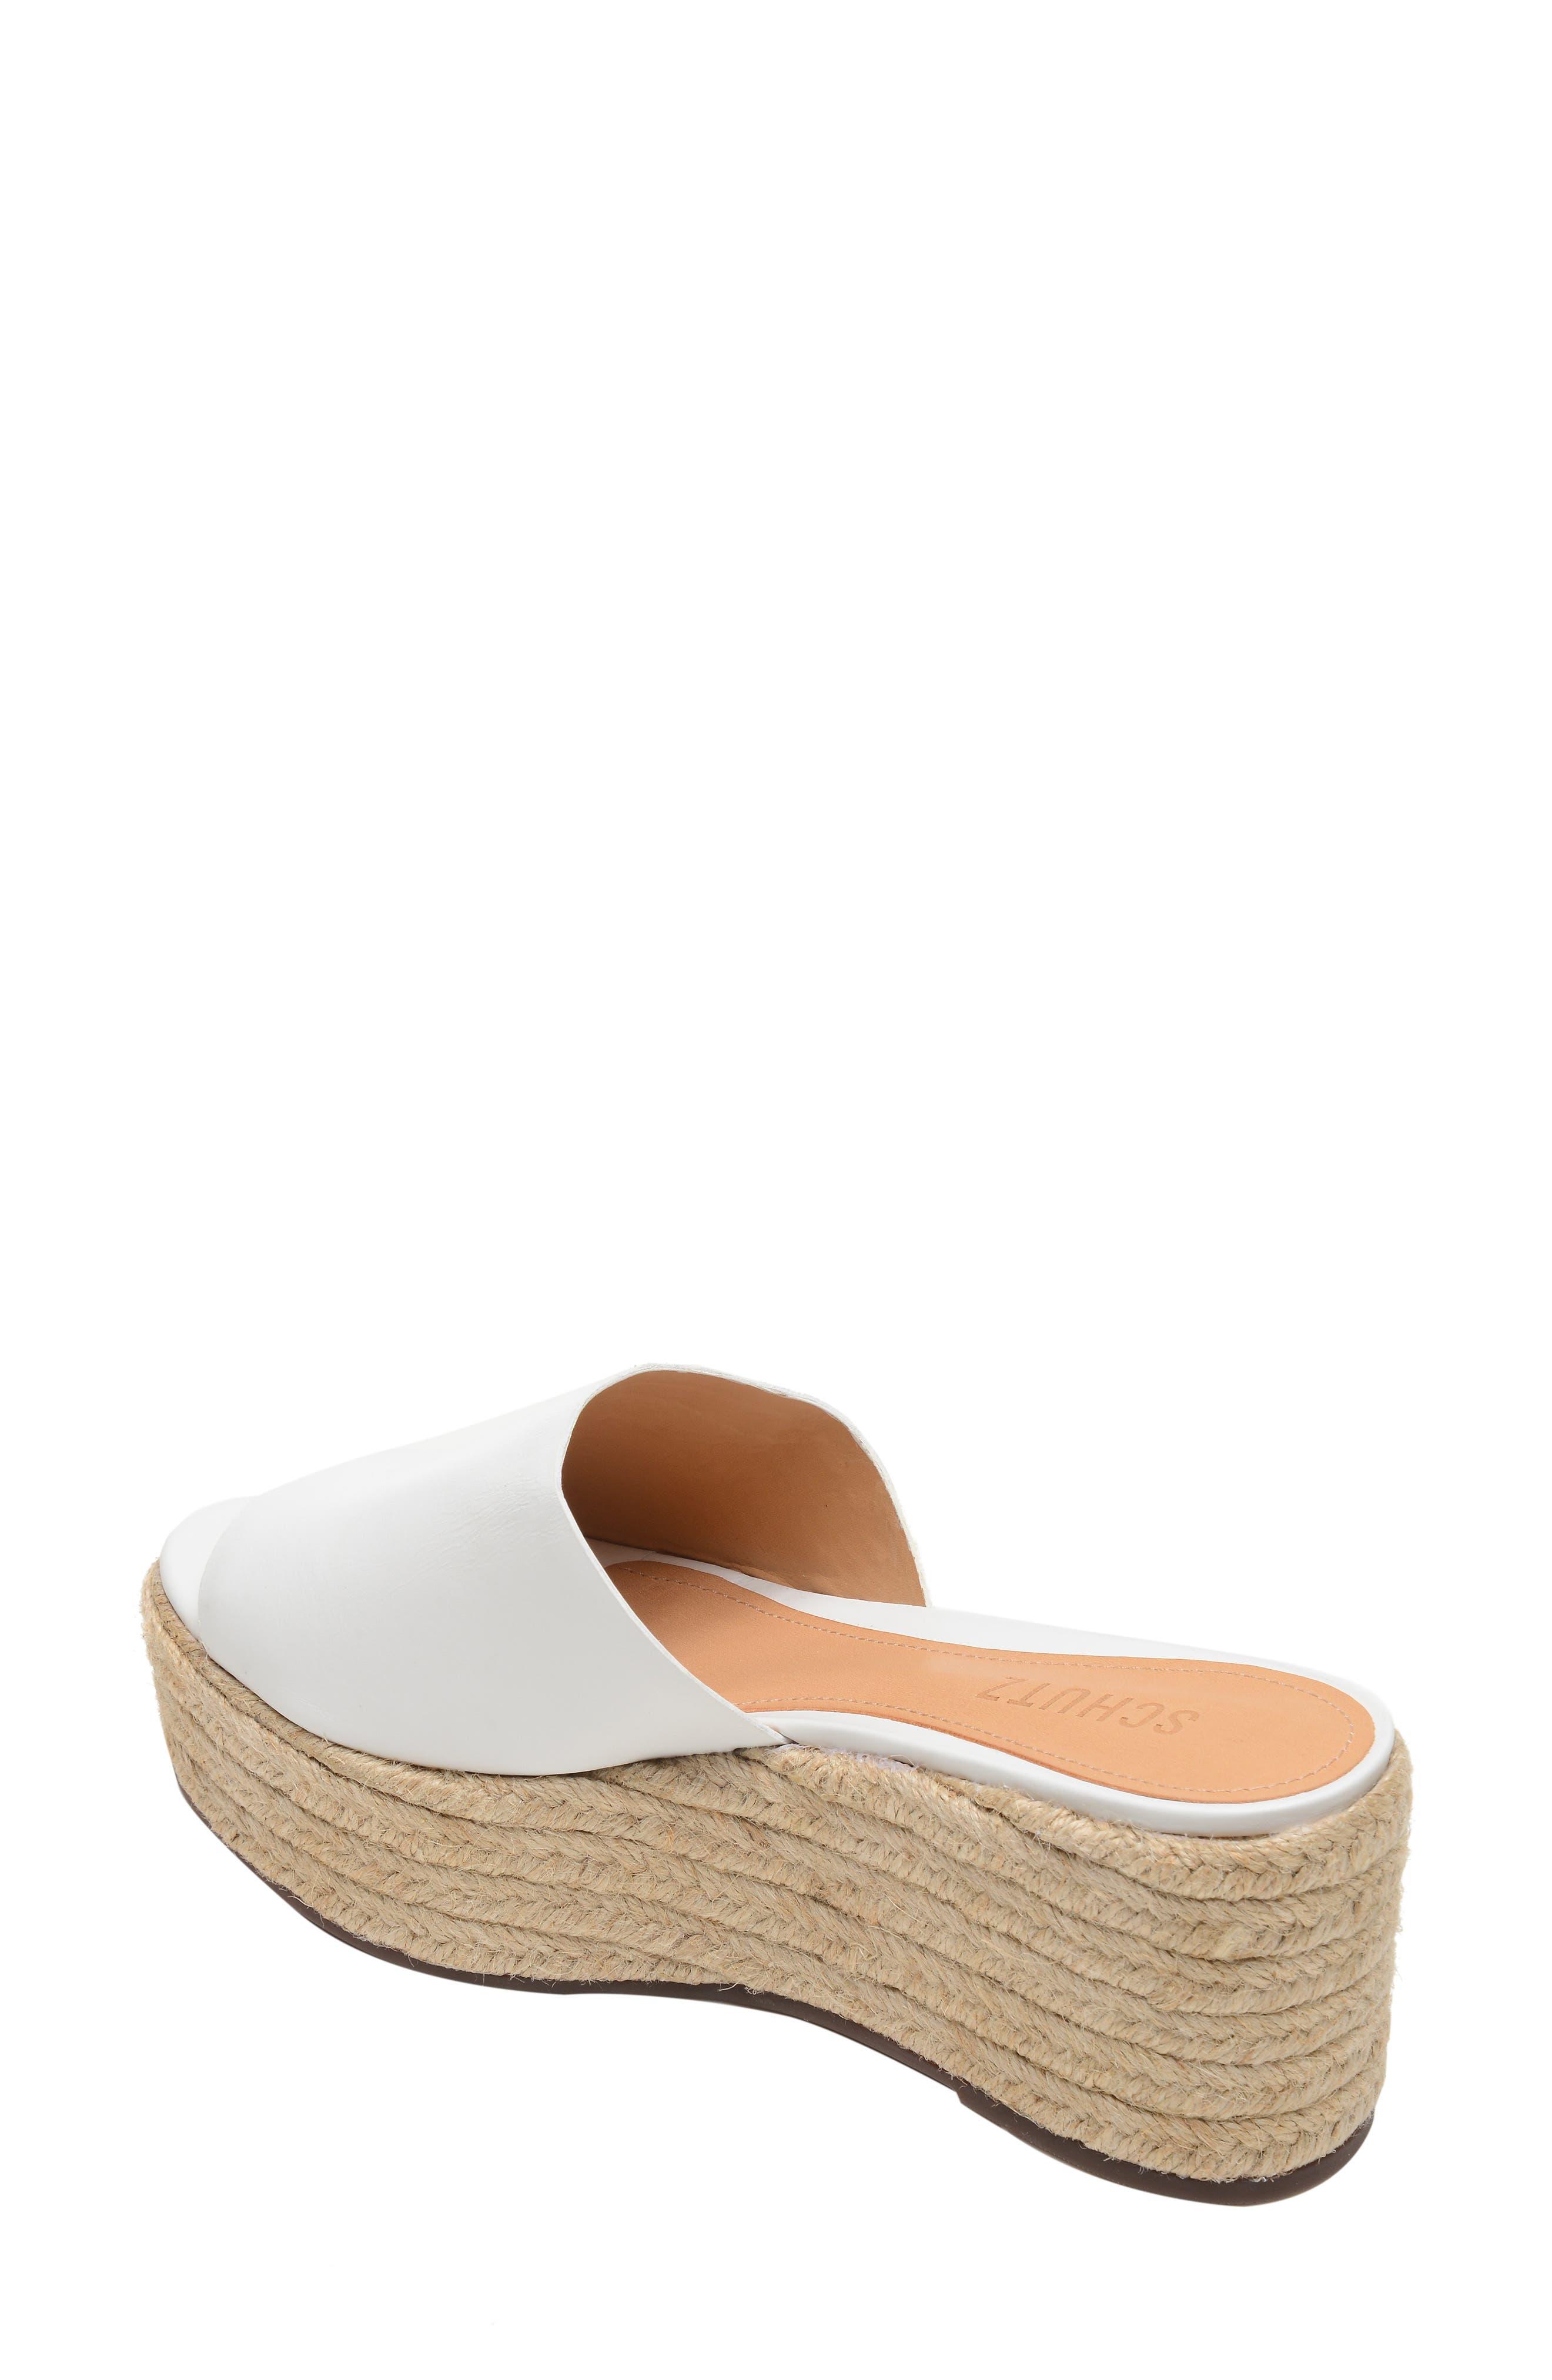 SCHUTZ, Thalia Platform Wedge Slide Sandal, Alternate thumbnail 2, color, WHITE